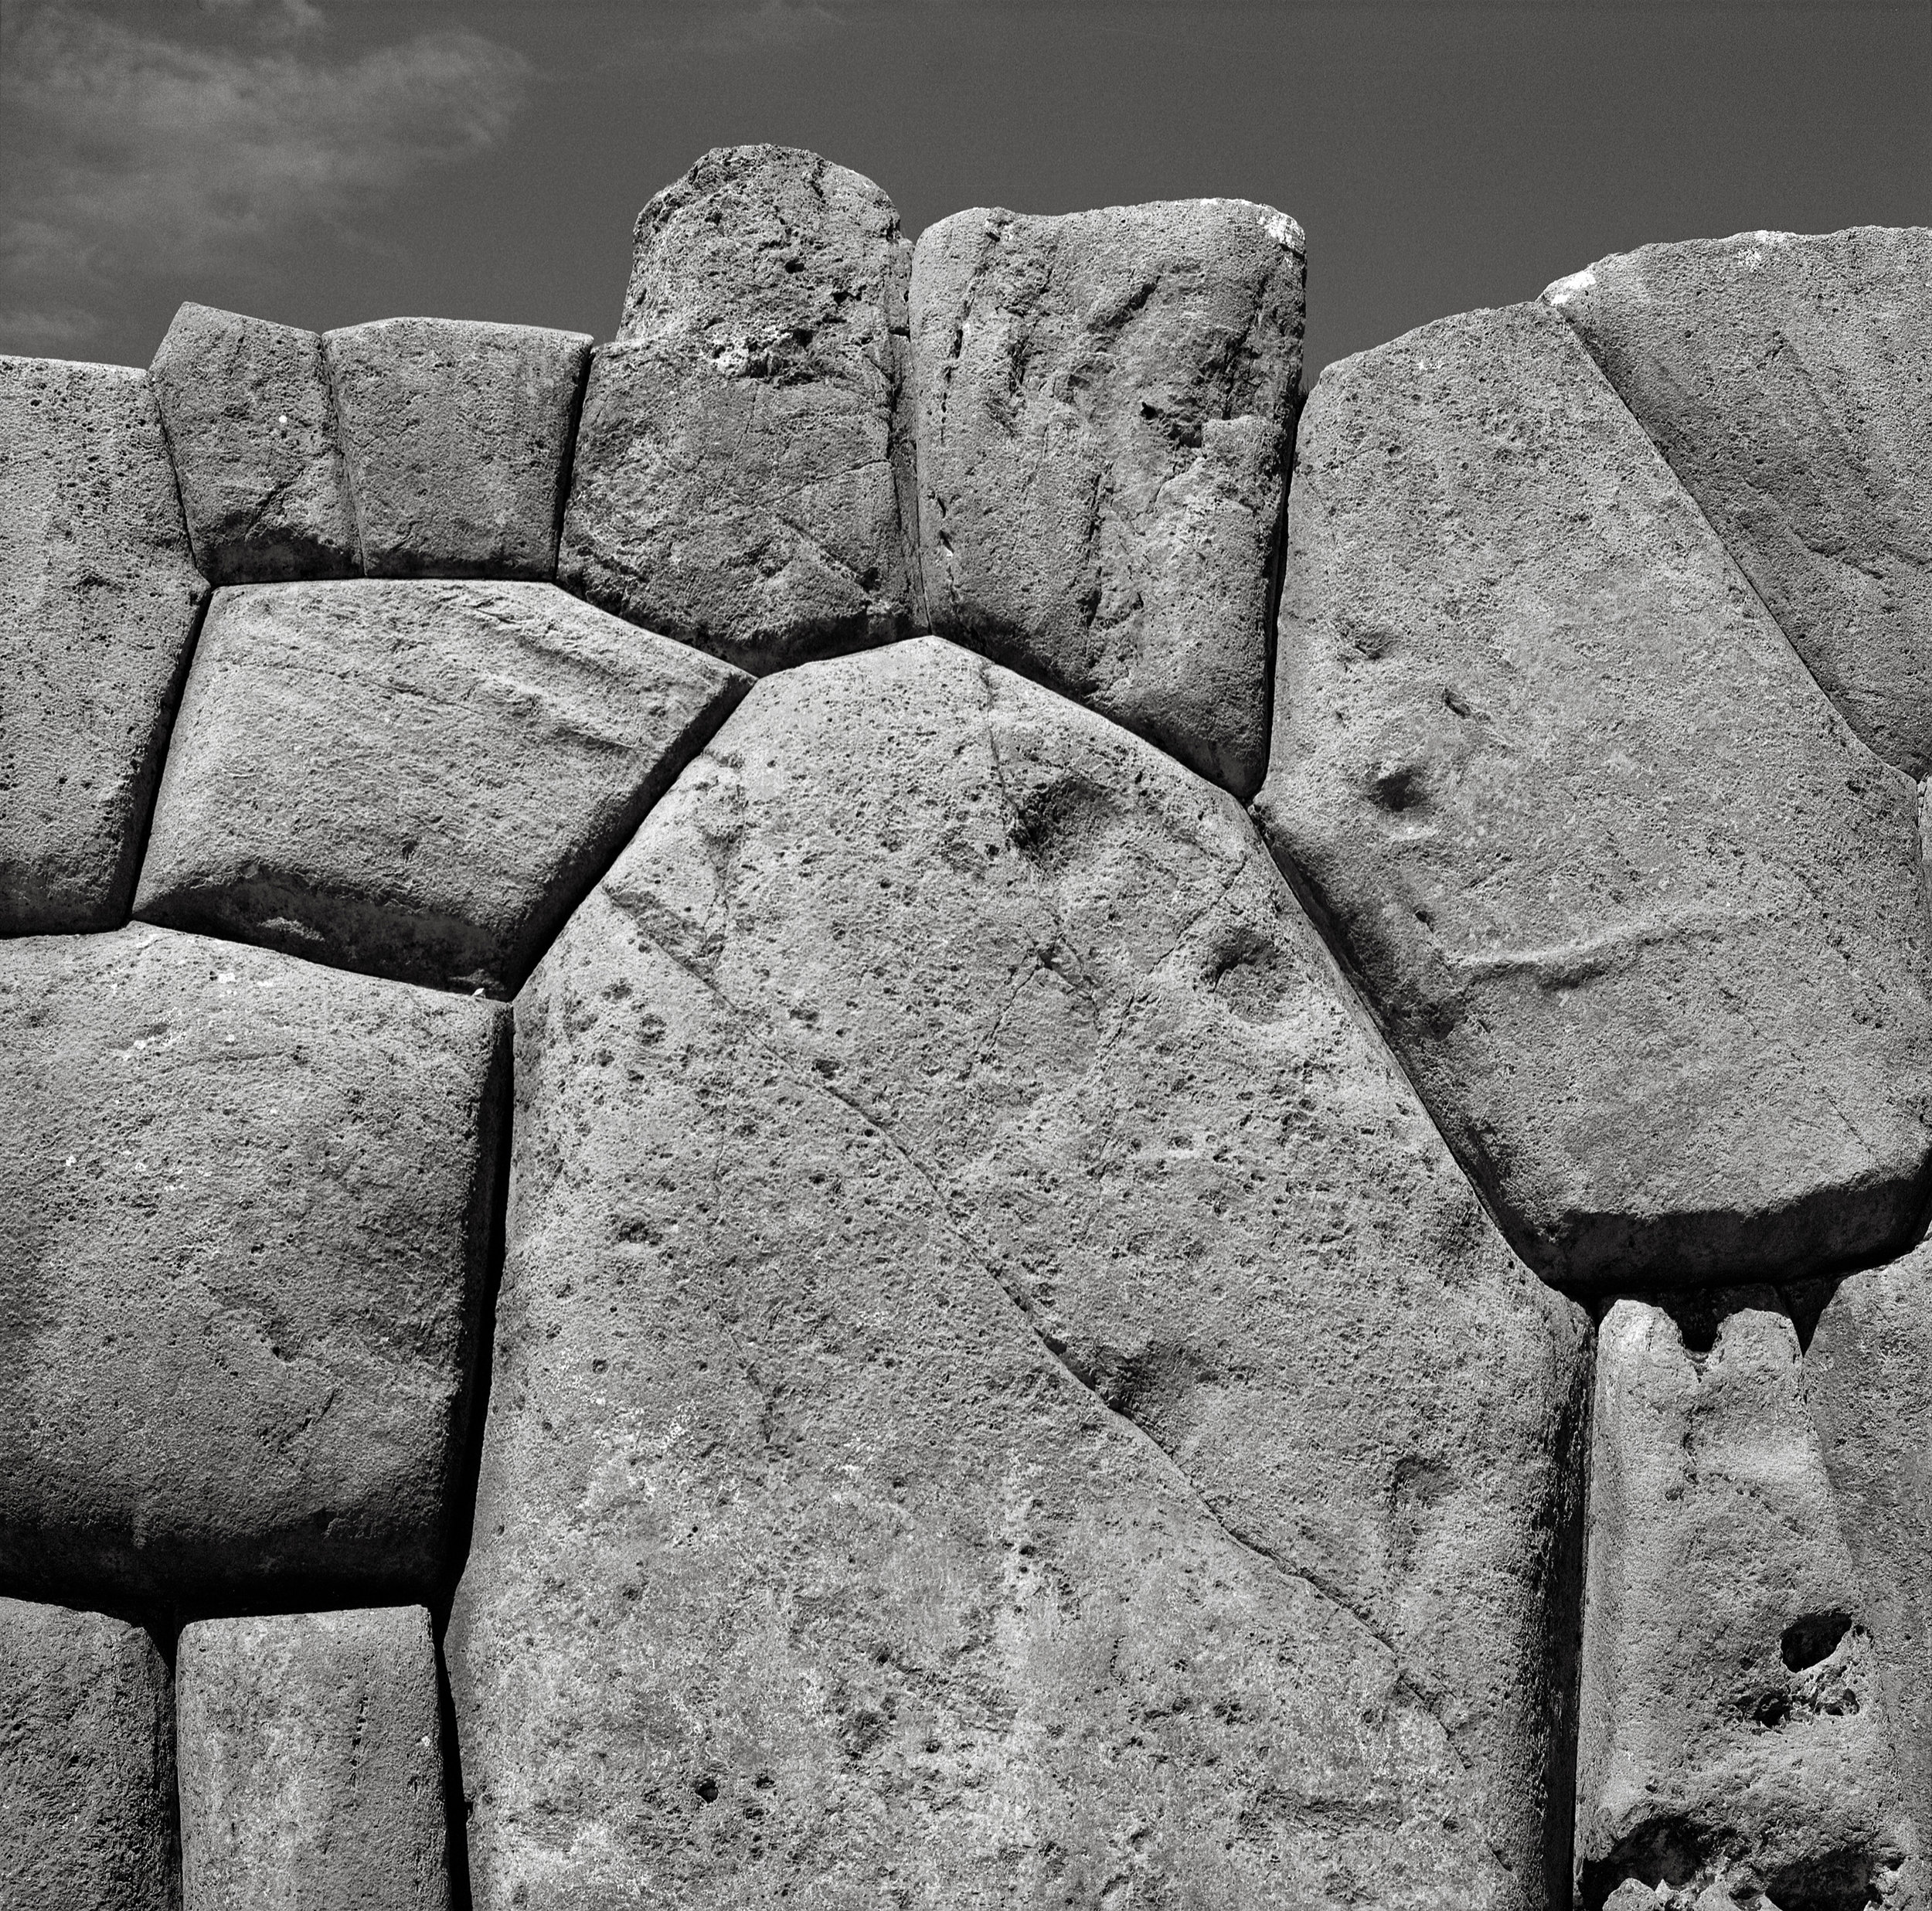 Inca Stonework, Sacsayhuaman, Cusco, Peru